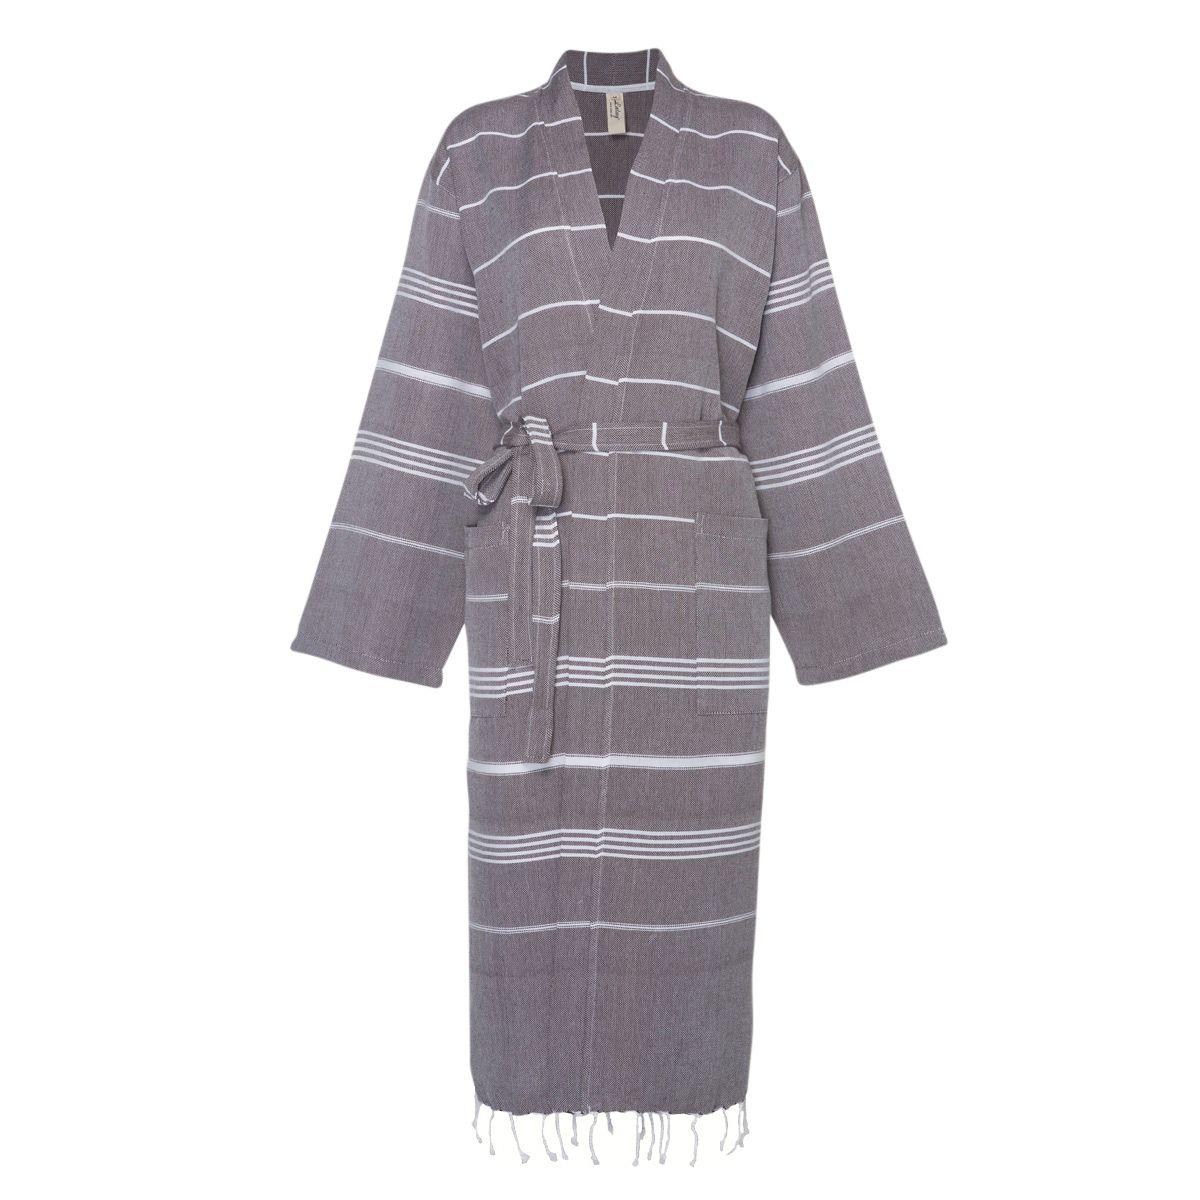 Bathrobe Leyla / Kimono Collar - Brown